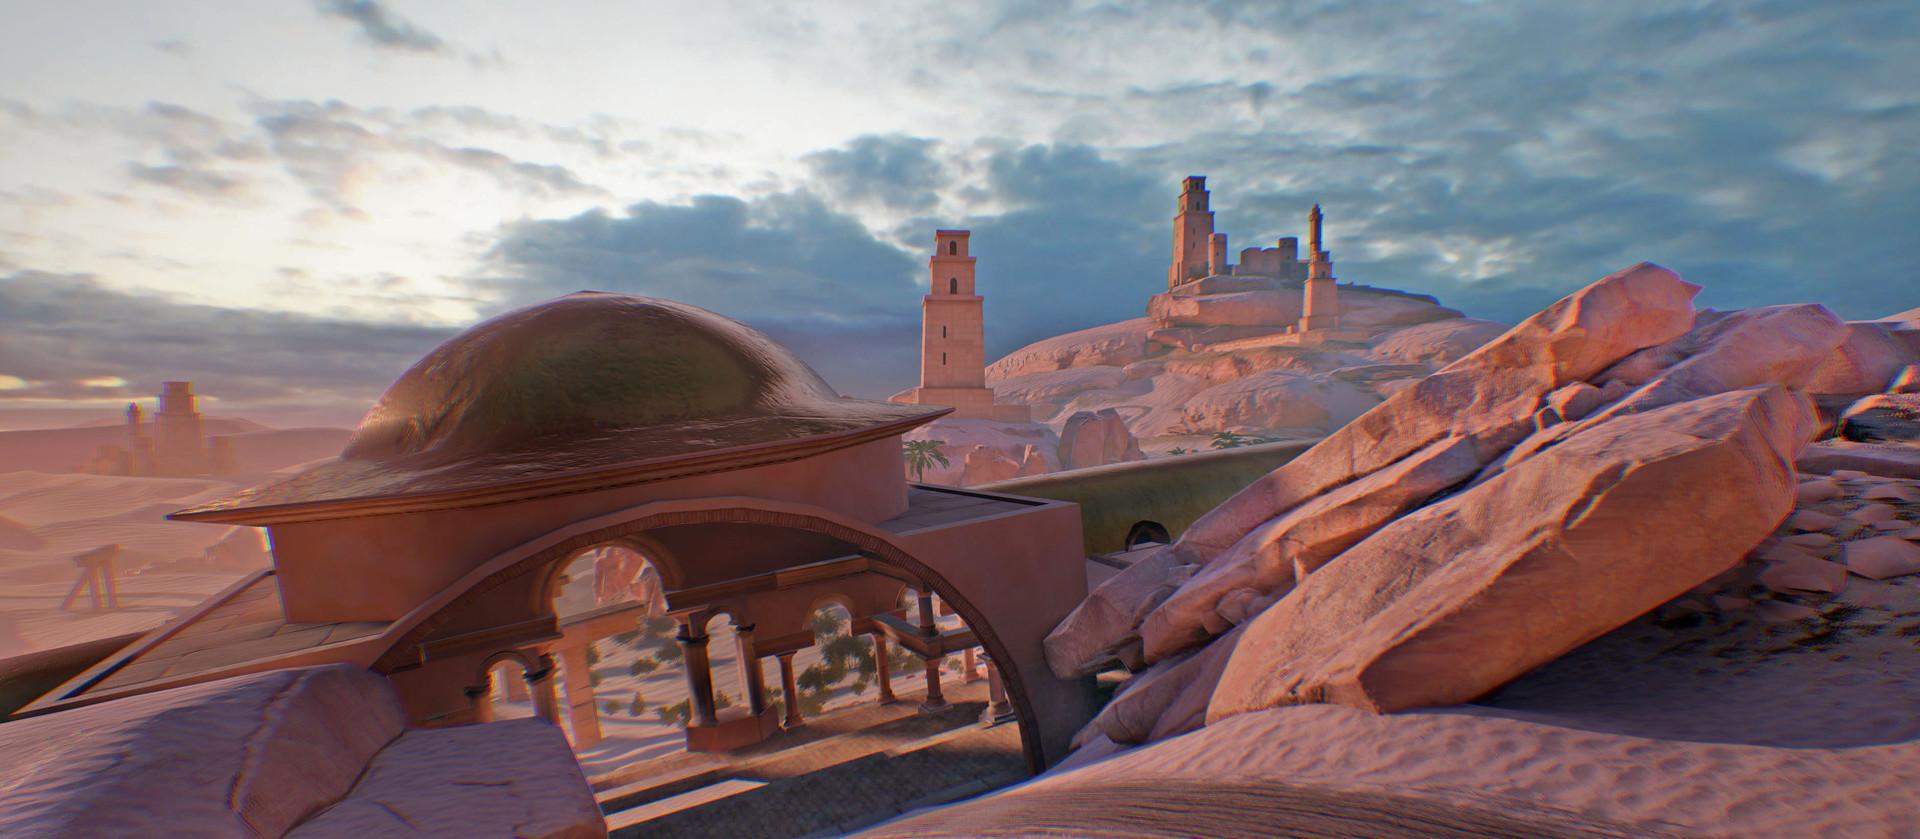 Florian thomasset desert temple 6 1